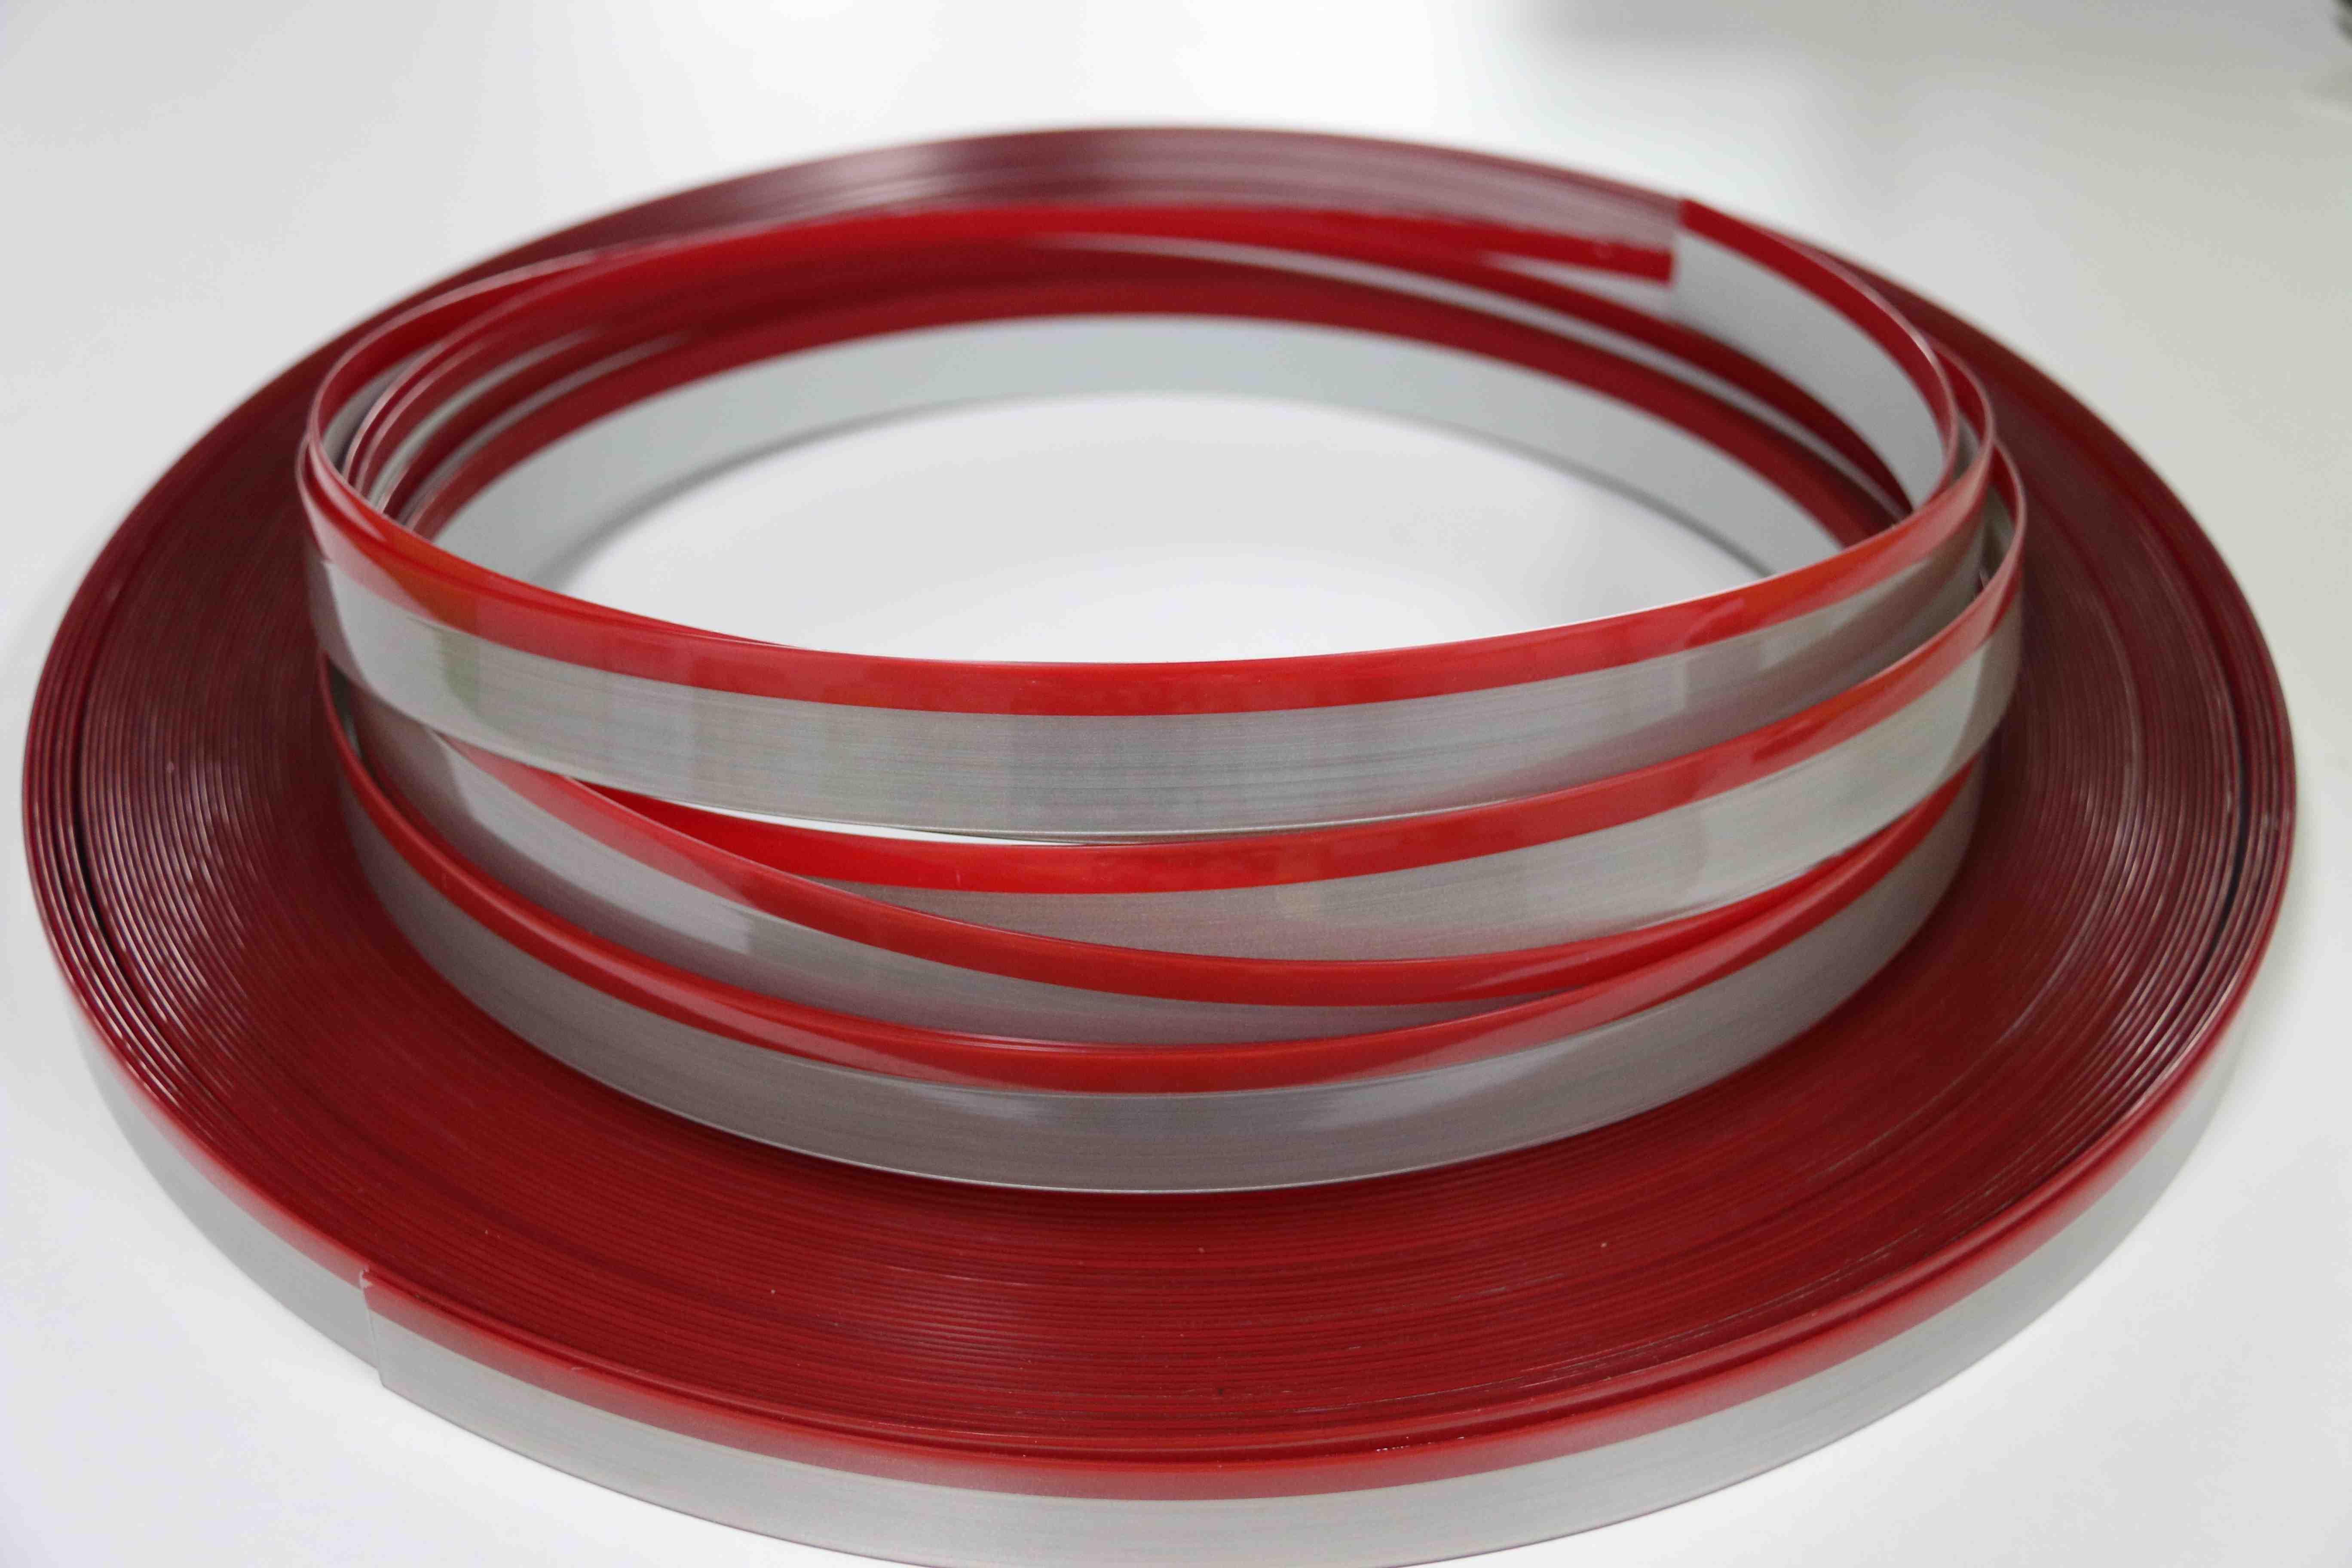 pmma edge banding/Plastic Furniture /Functional Furniture